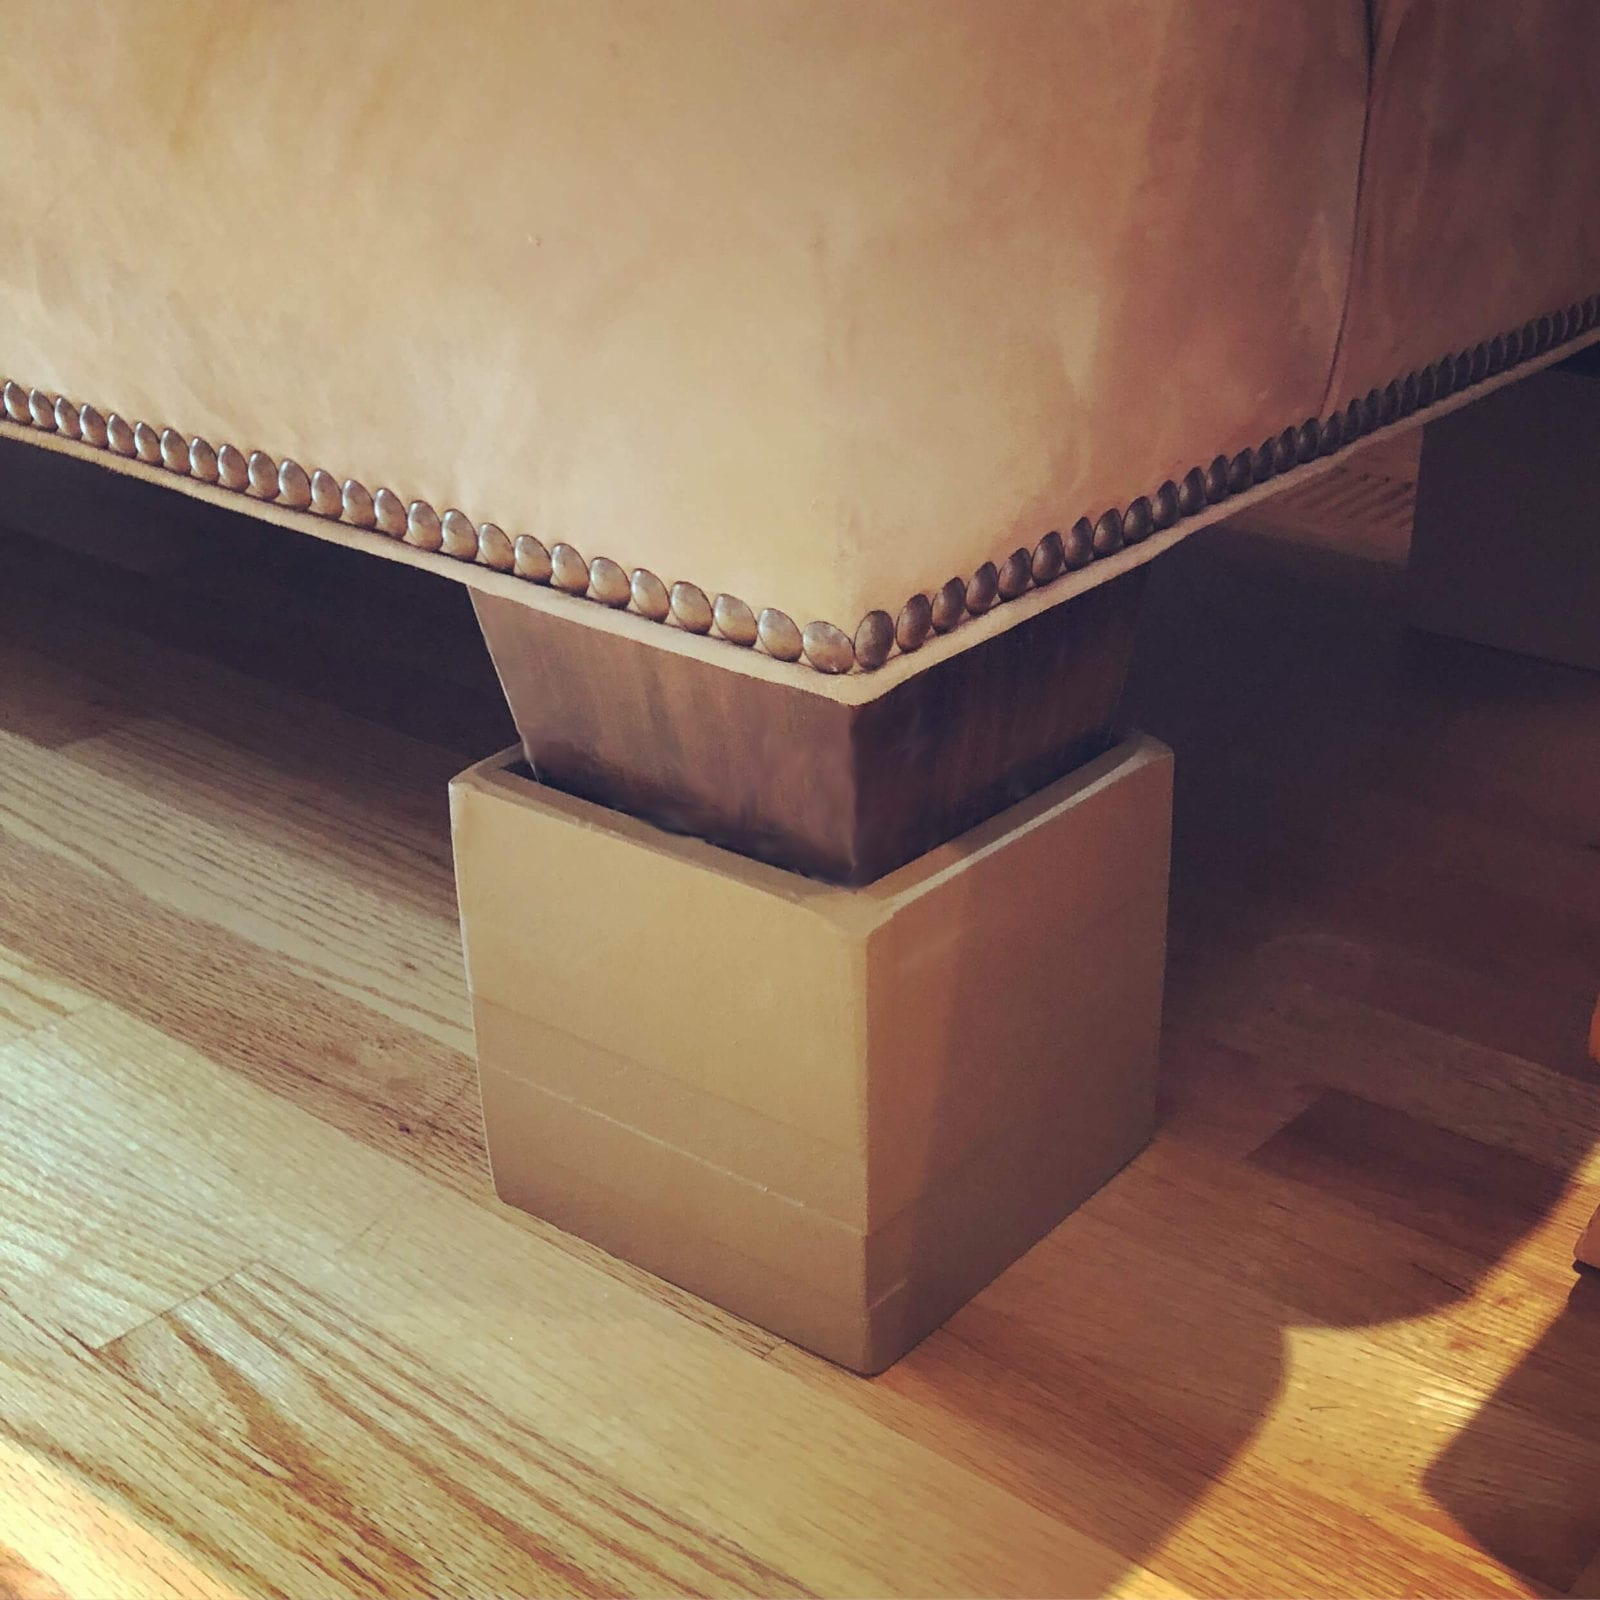 Brad S's Sofa